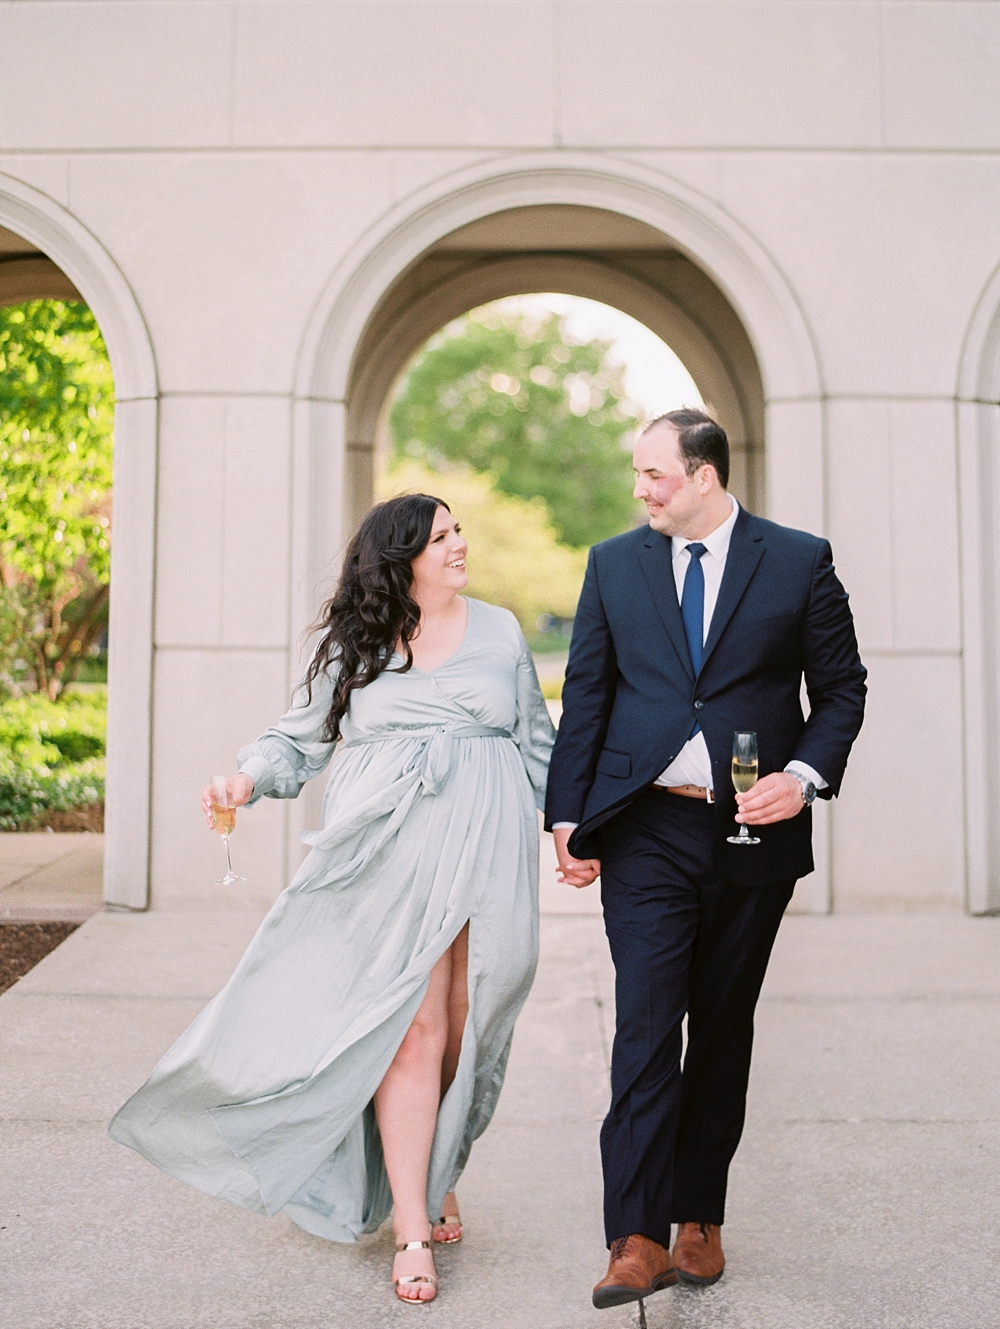 kristin-la-voie-photography-chicago-wedding-photographer-loyola-engagement-23